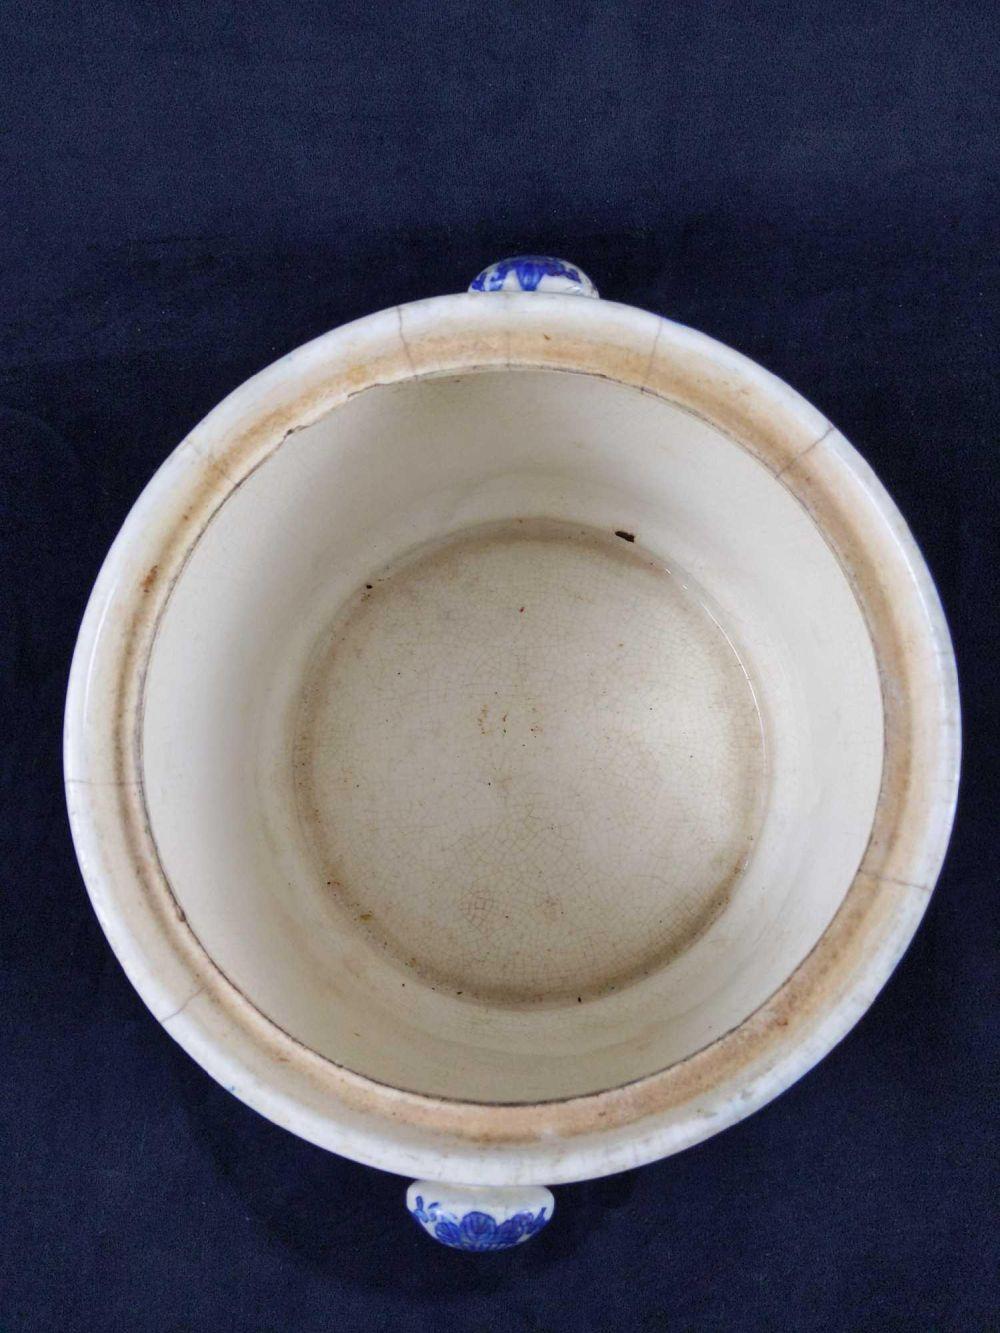 Lot 252: Antique Moriyama Japan Blue Willow Biscuit Jar No Lid